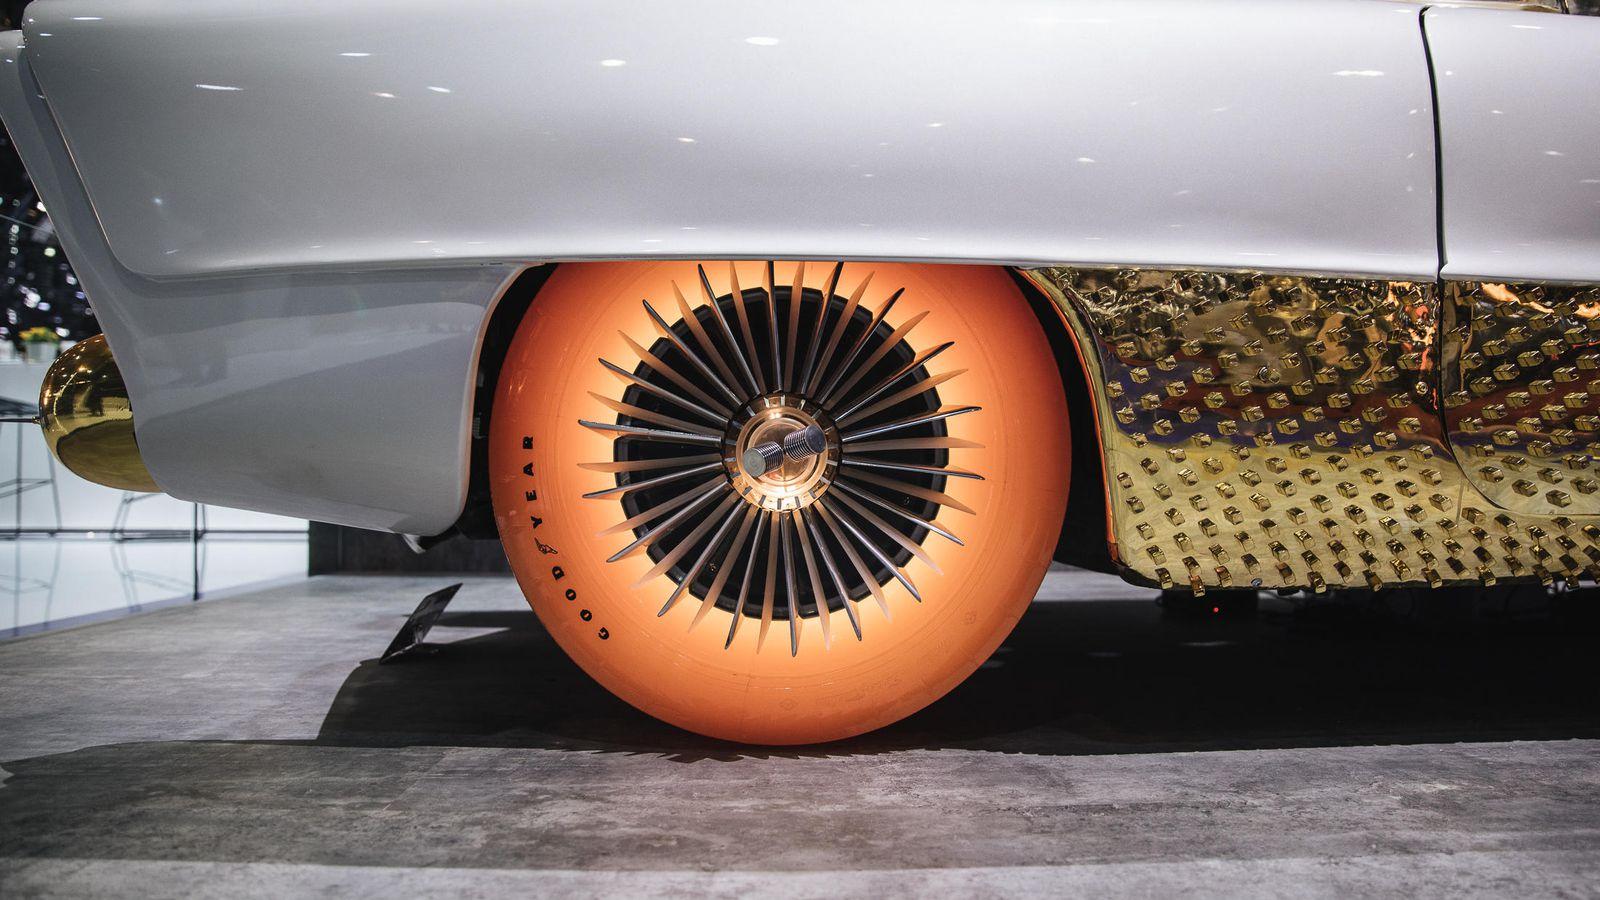 Goodyear Golden Sahara II lastik konsept